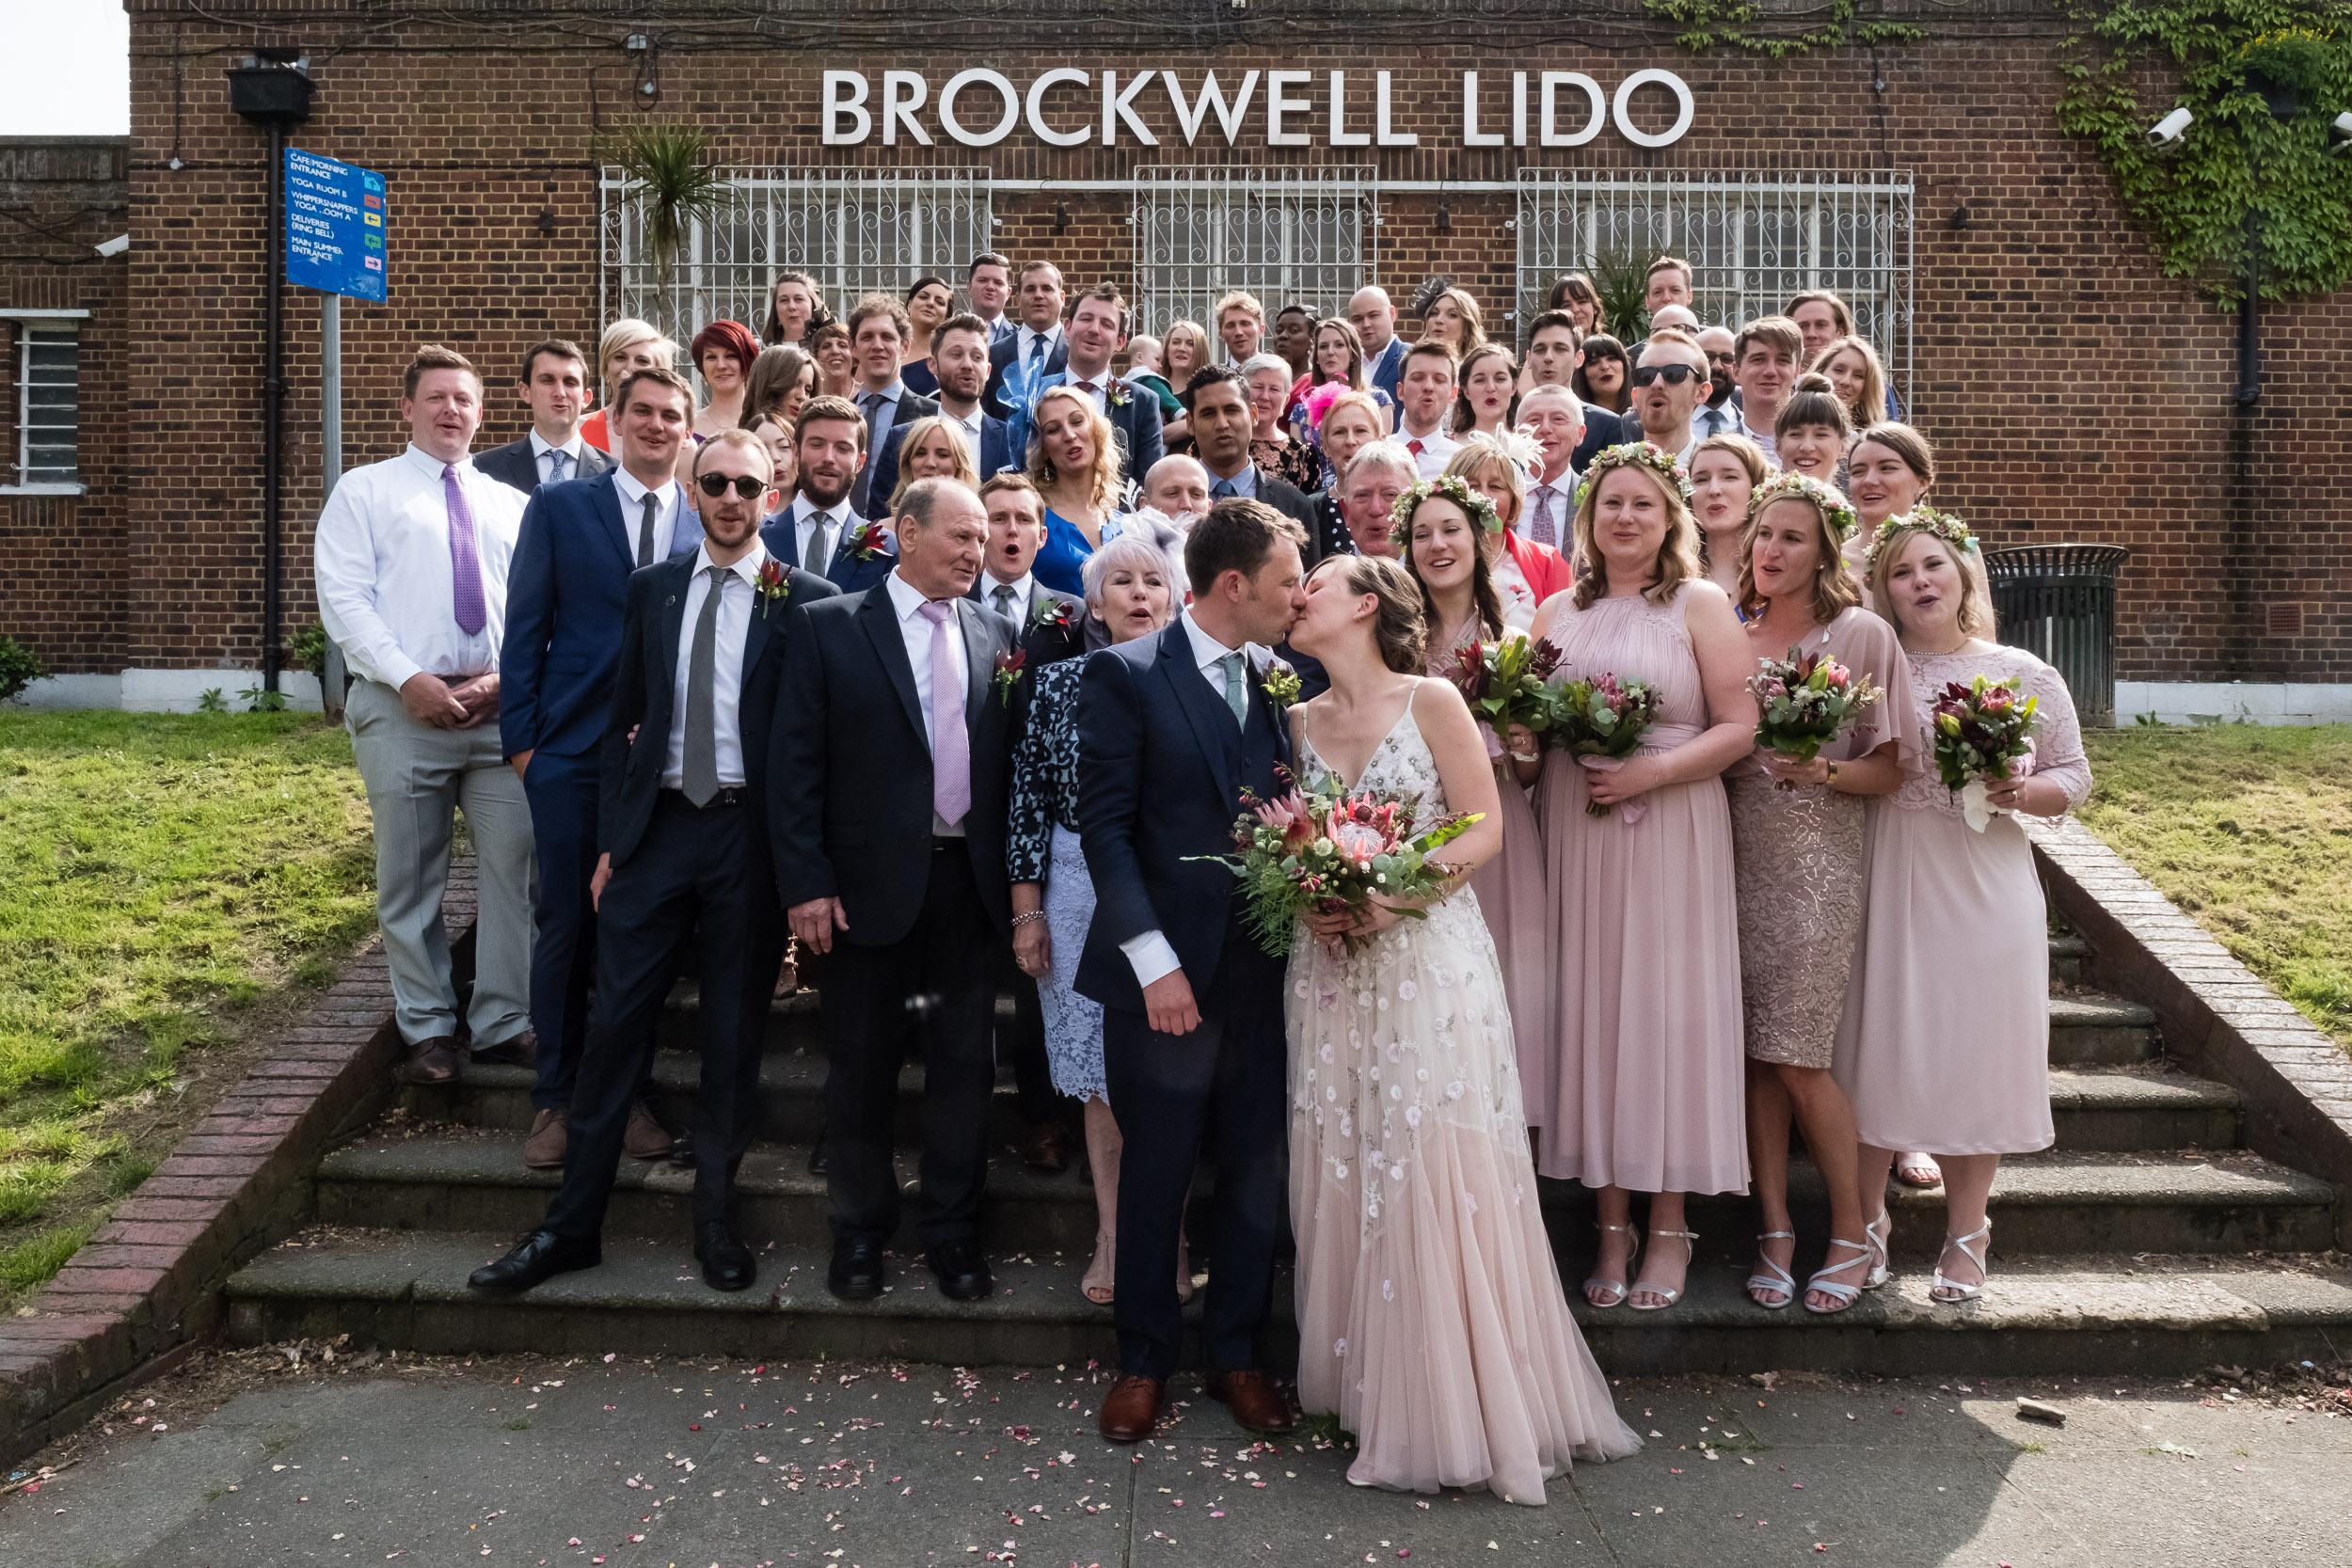 brockwell-lido-brixton-herne-hill-wedding-224.jpg